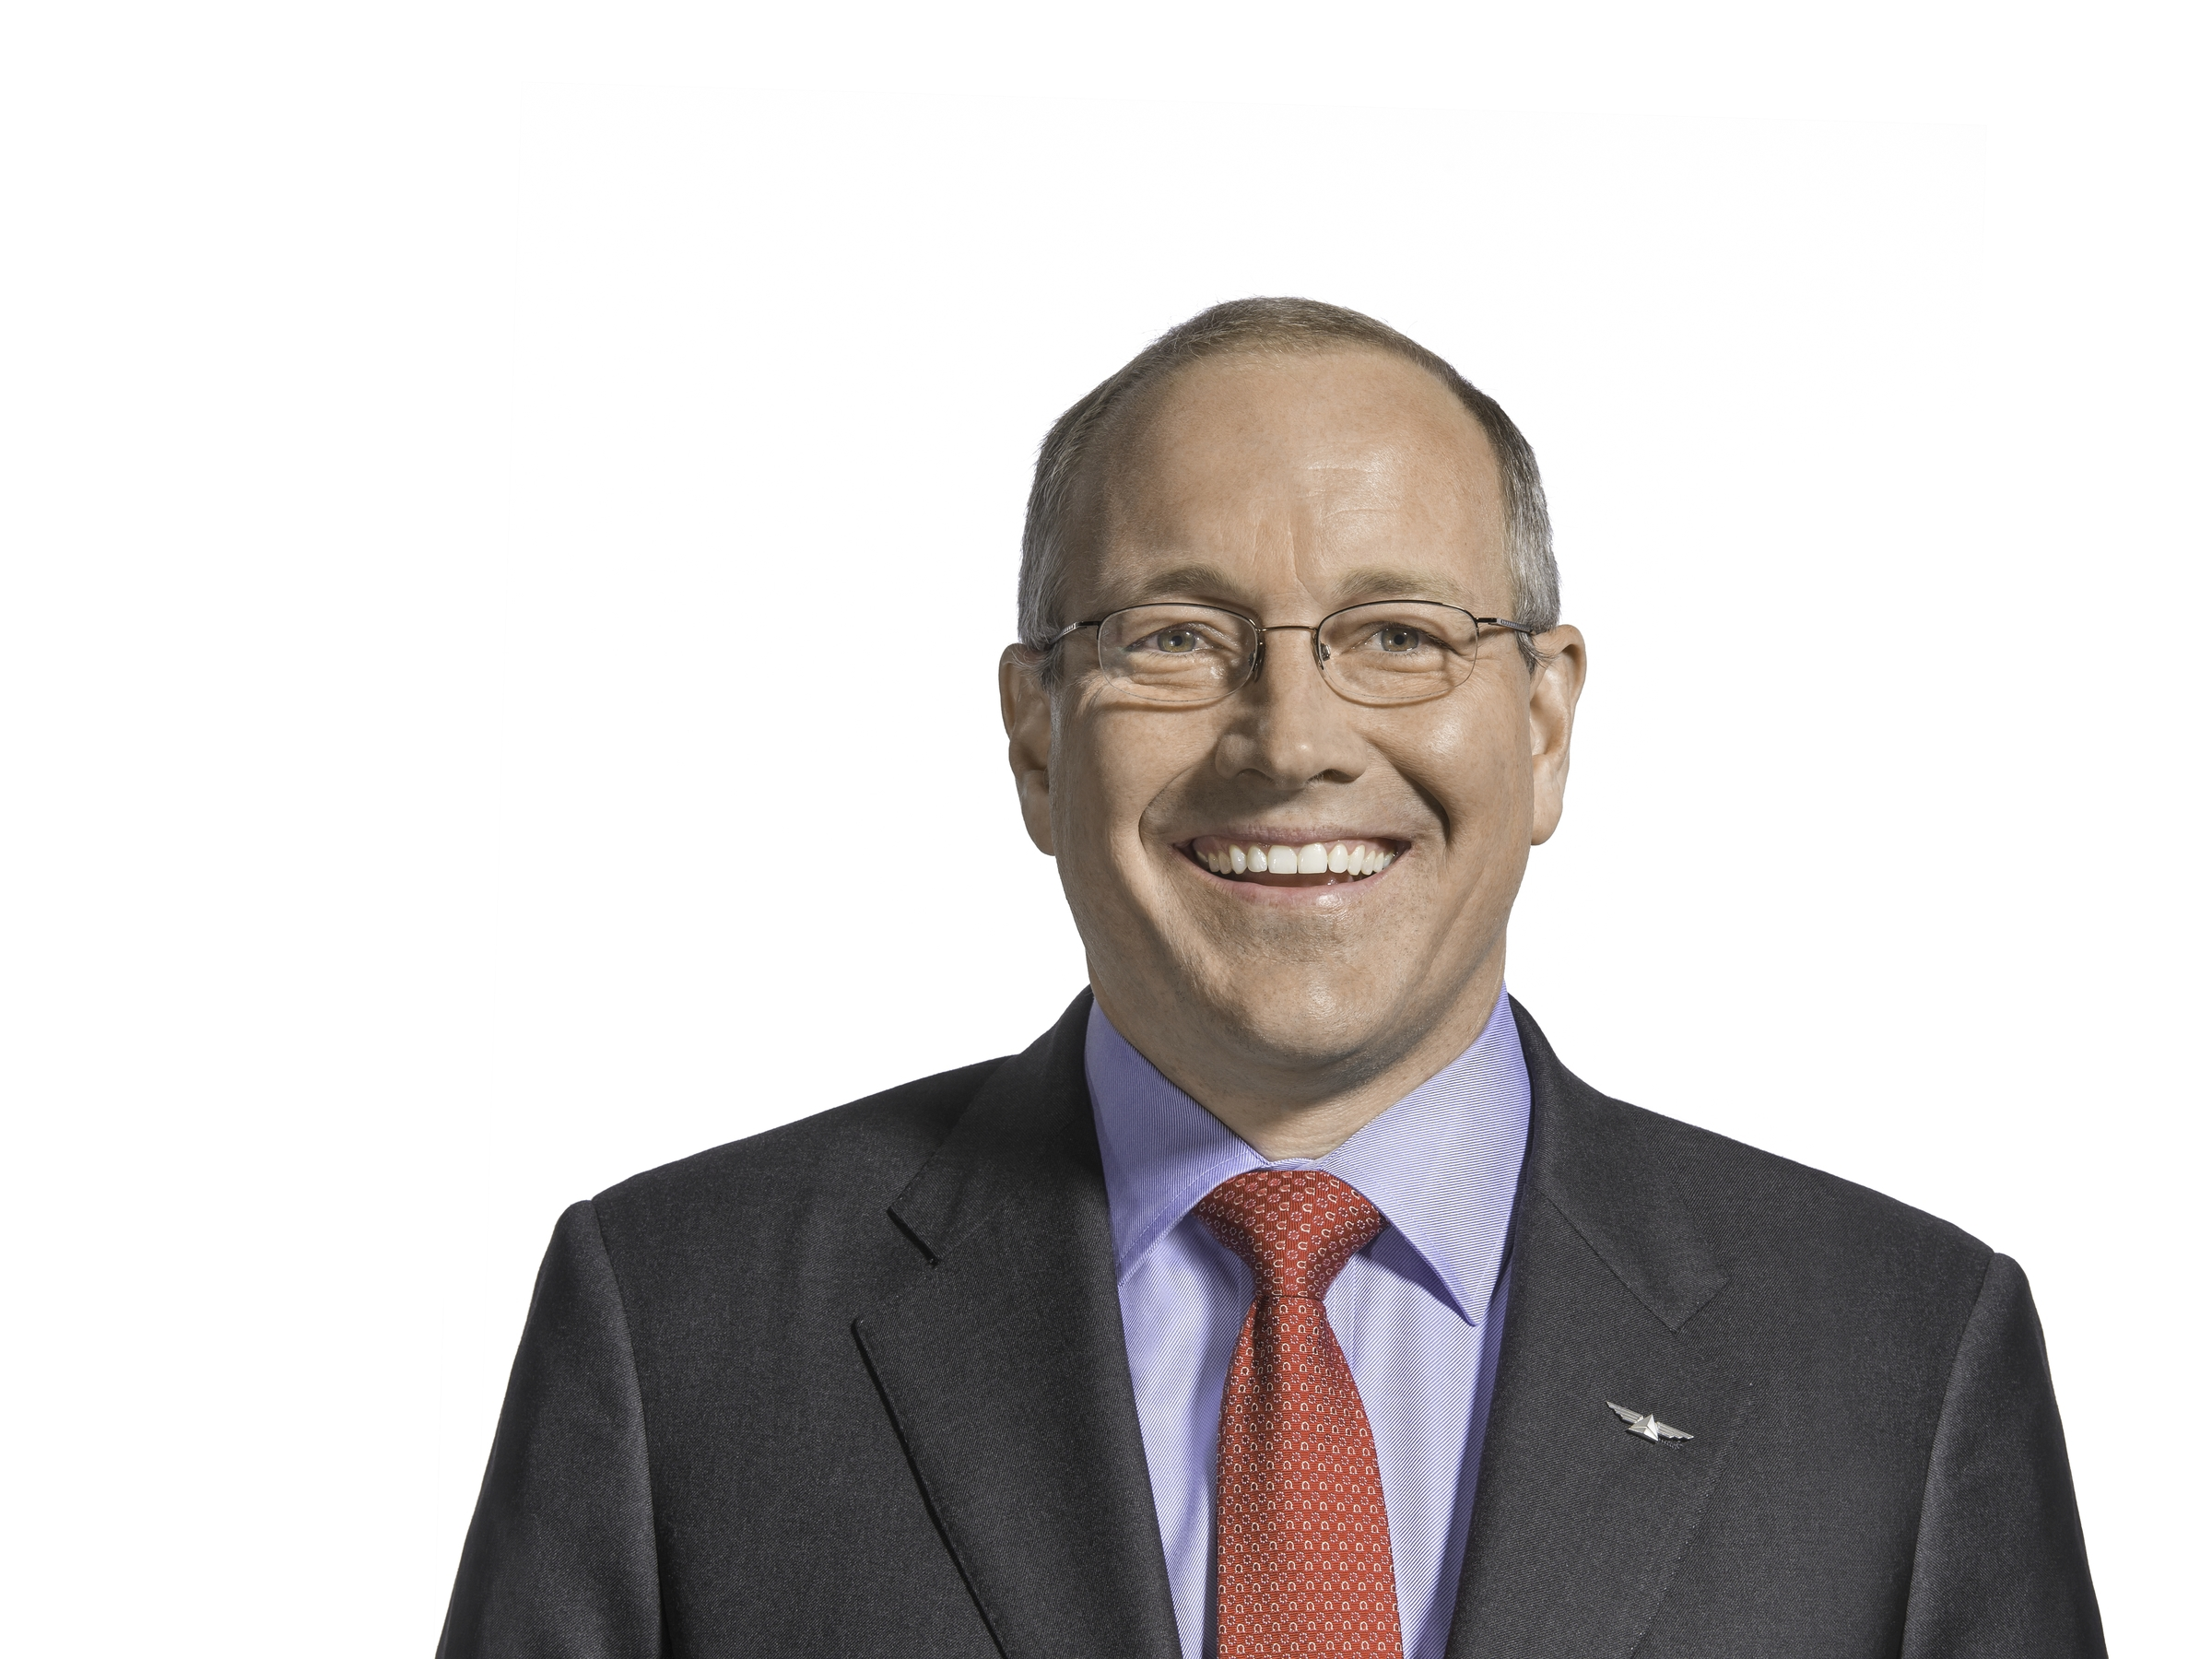 Steve Sear Executive Headshot